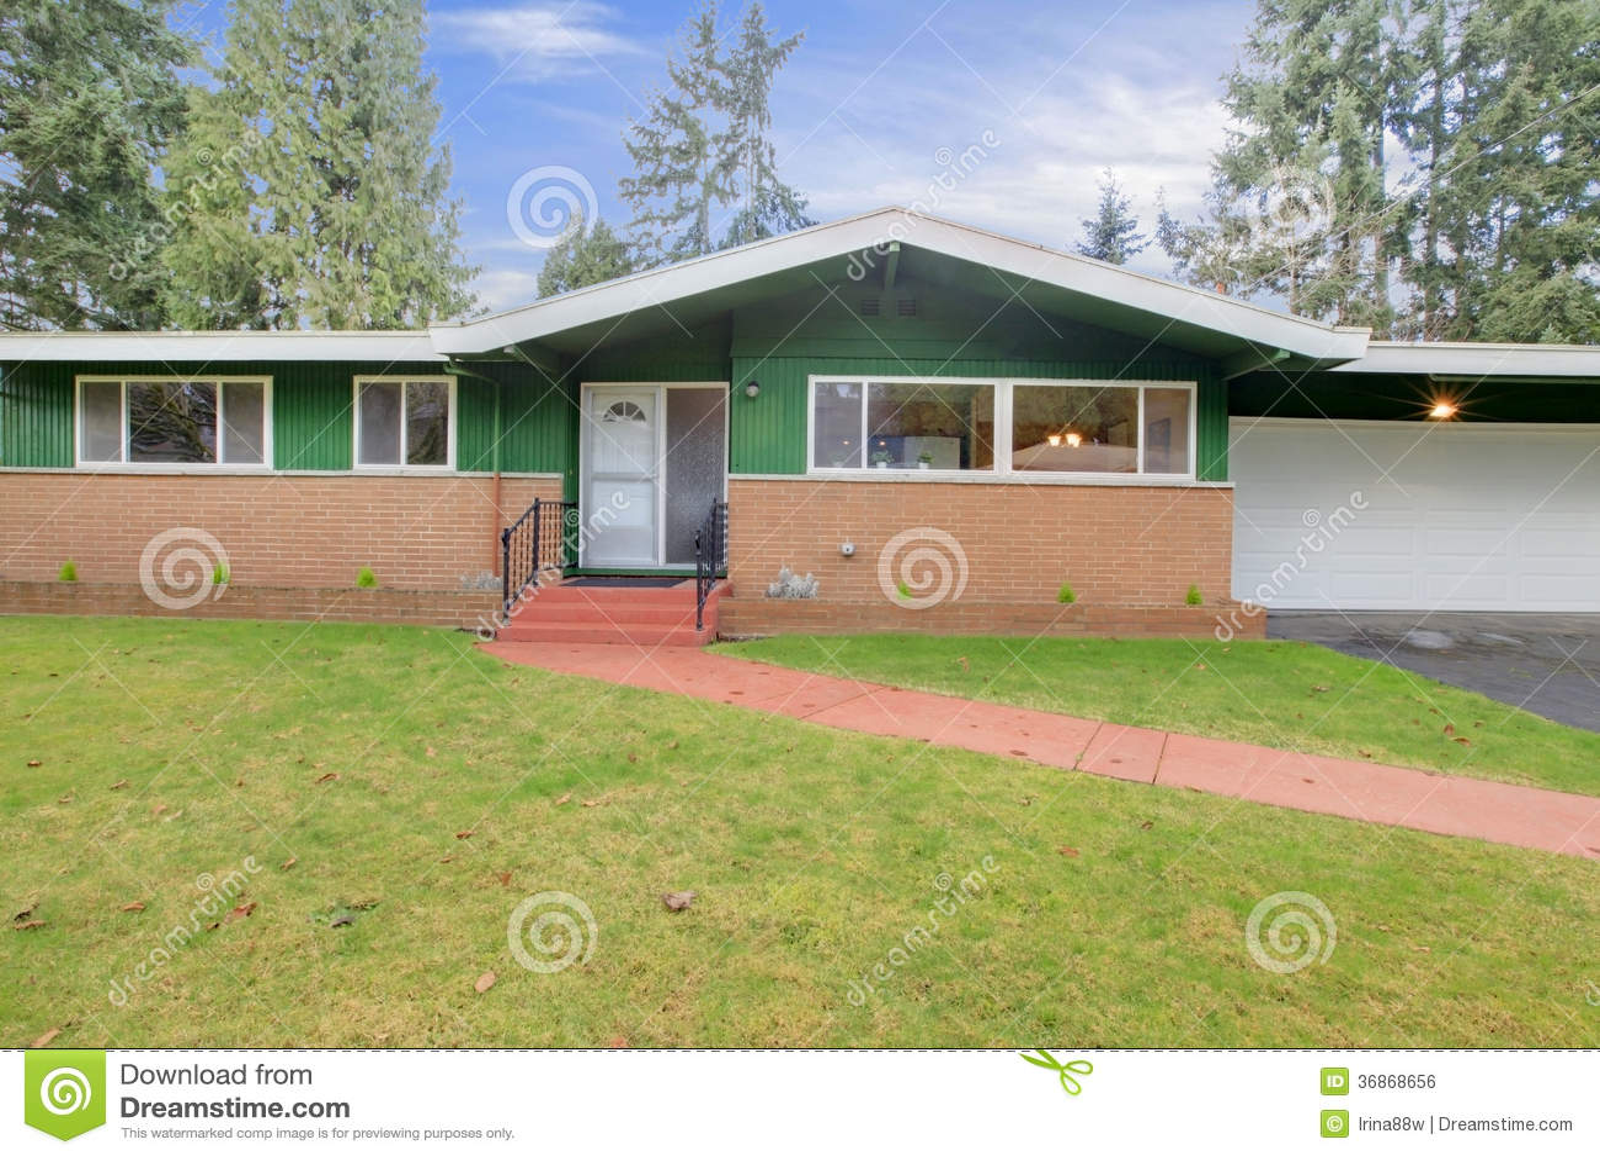 One story wood panel siding house royalty free stock image for Half brick half siding house